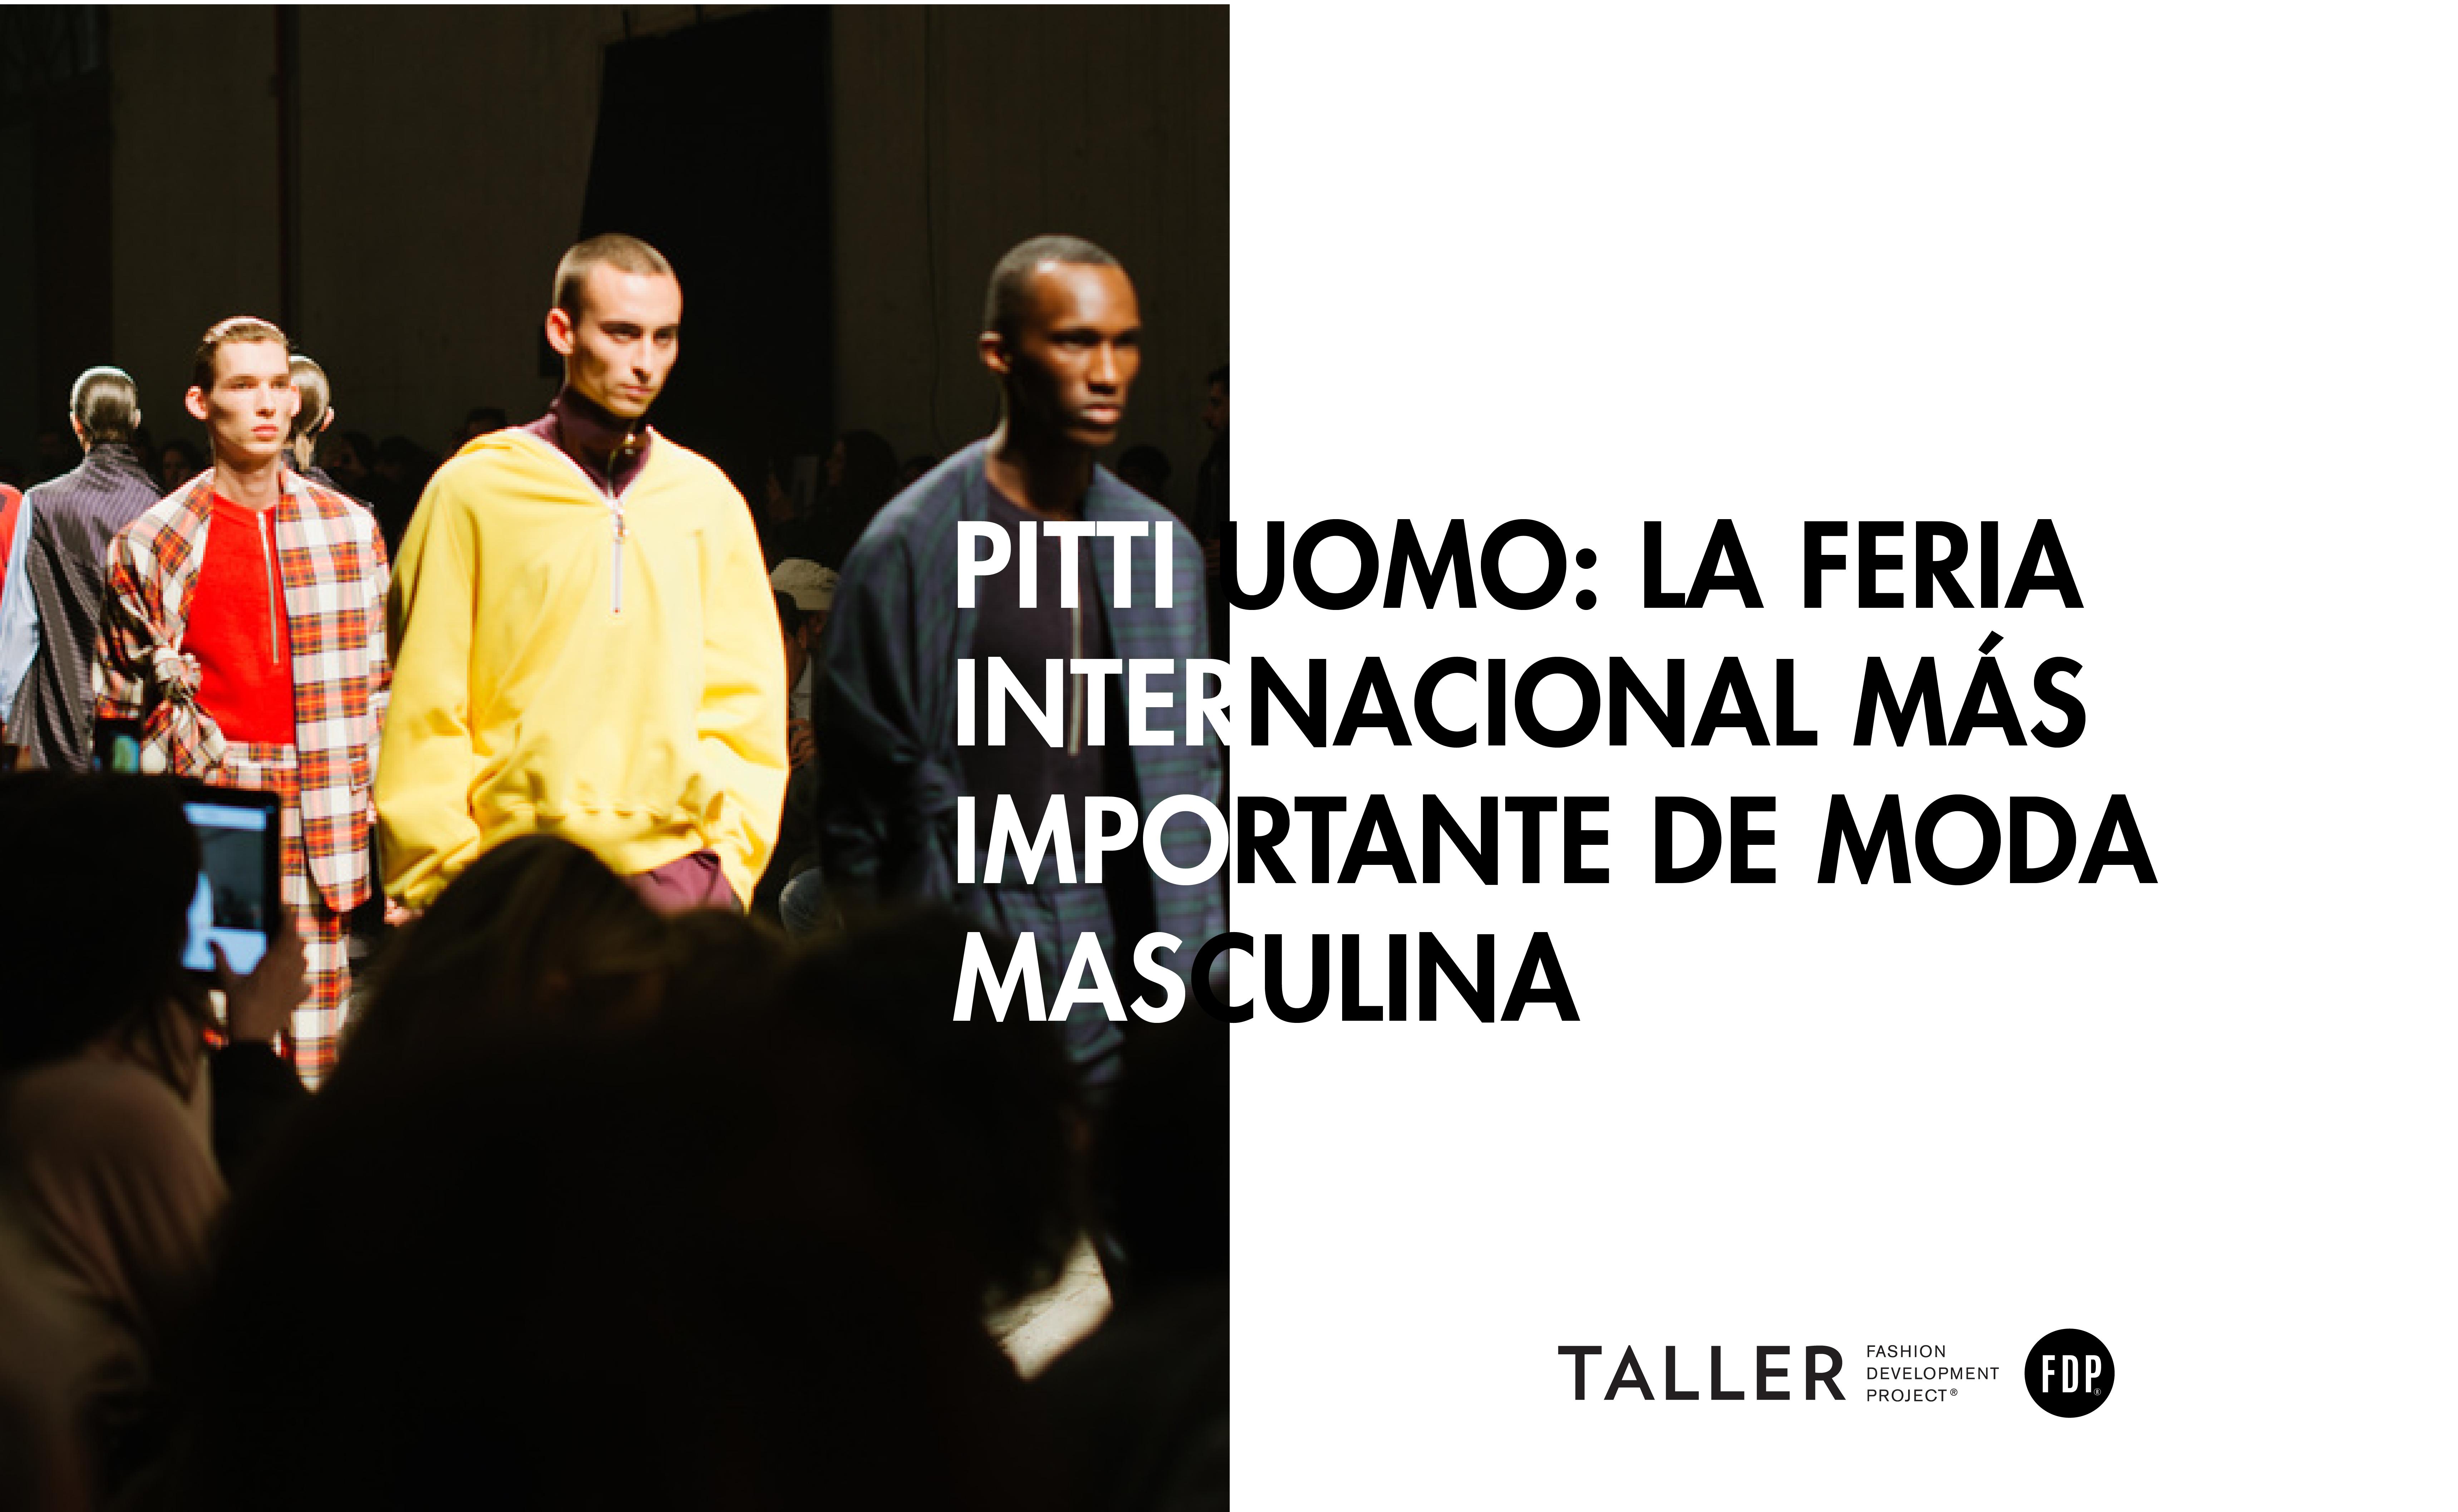 Executive Programs Abroad:  Pitti Uomo, la feria de moda masculina más importante del mundo